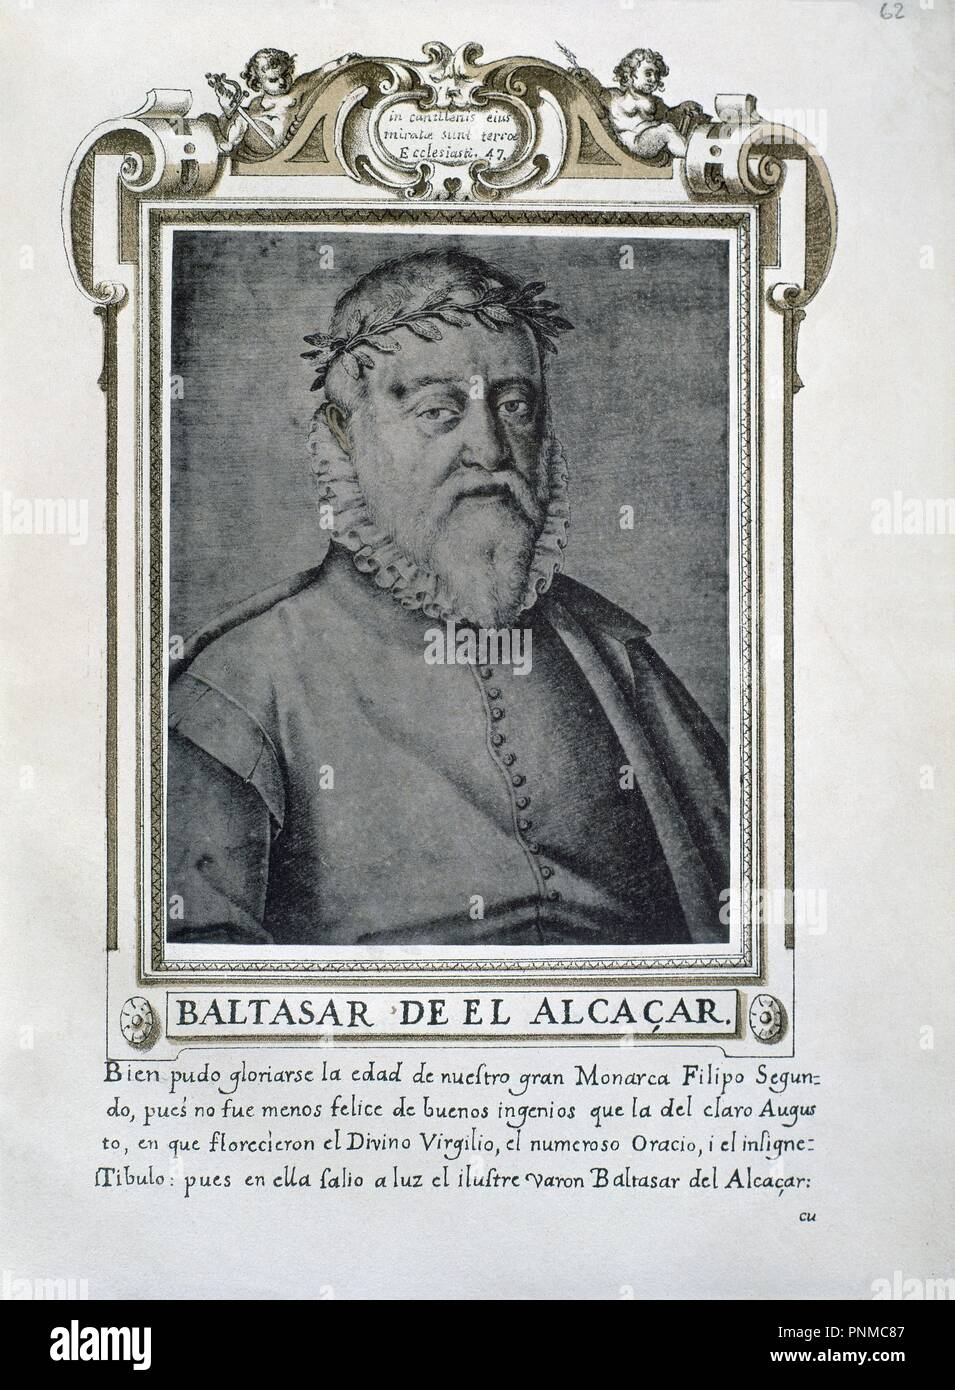 Baltasar del Alcazar alcazar poeta